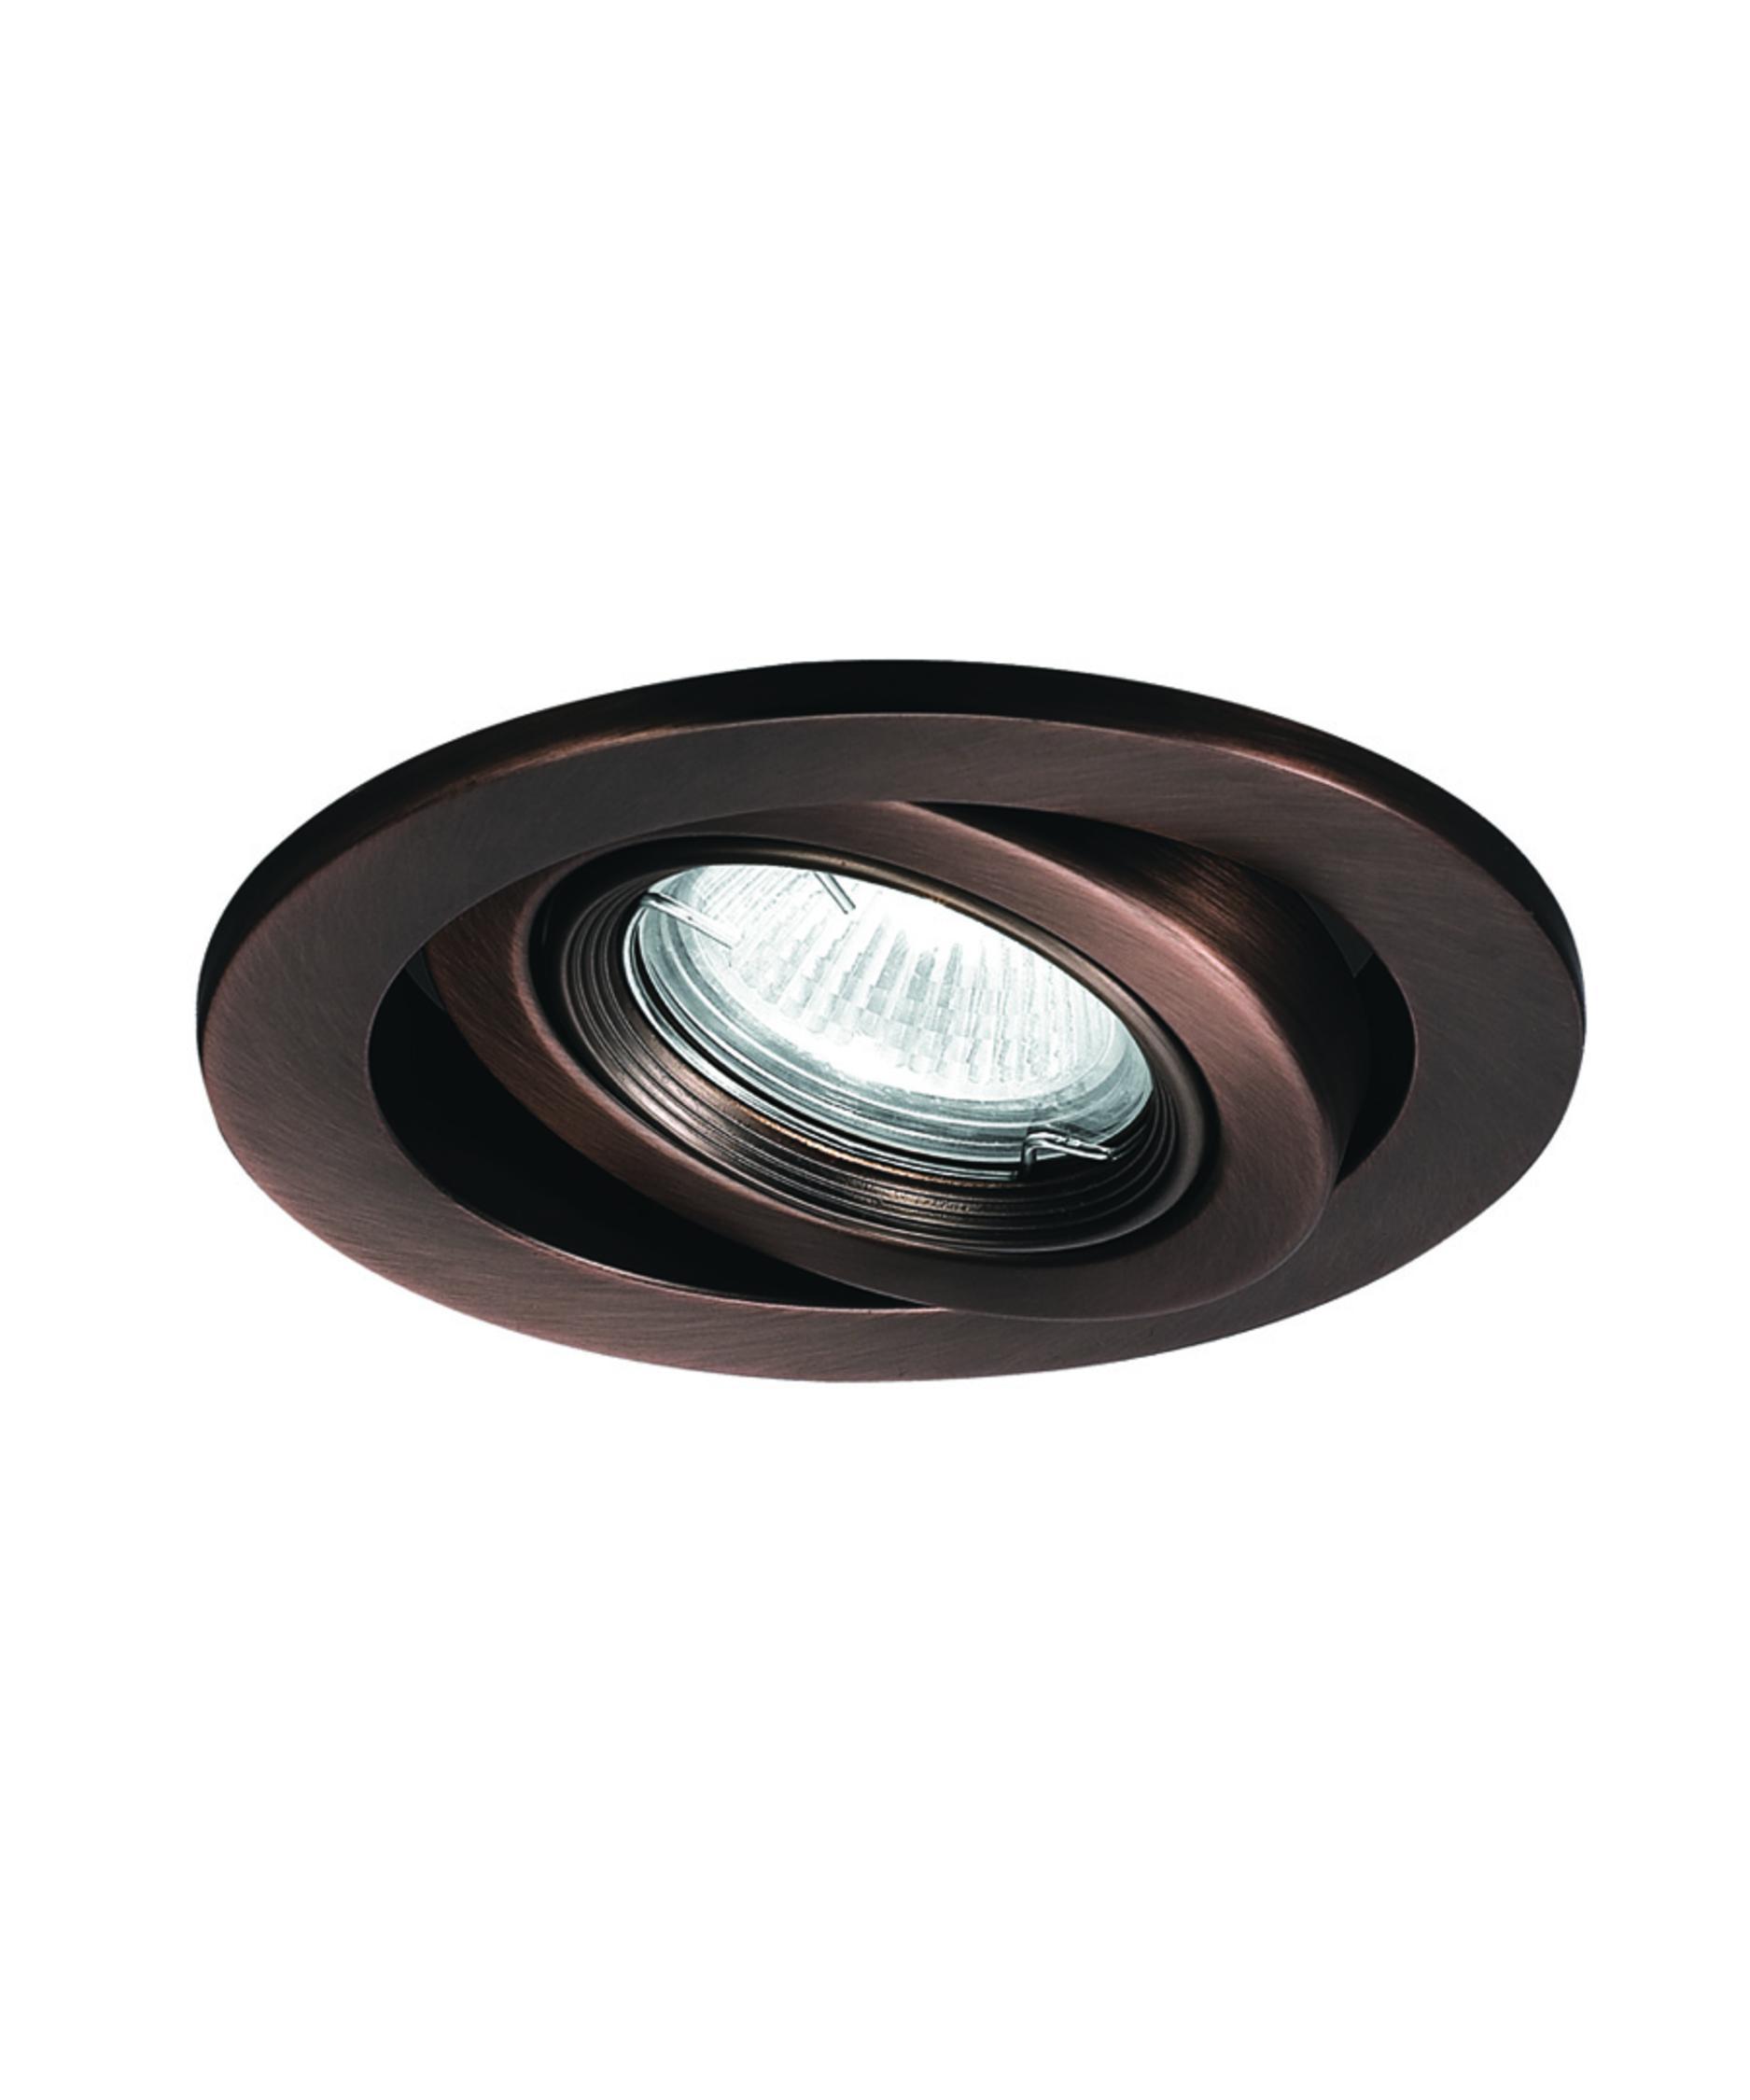 WAC Lighting HR 8417 Recessed Lighting Trim Capitol Lighting 1